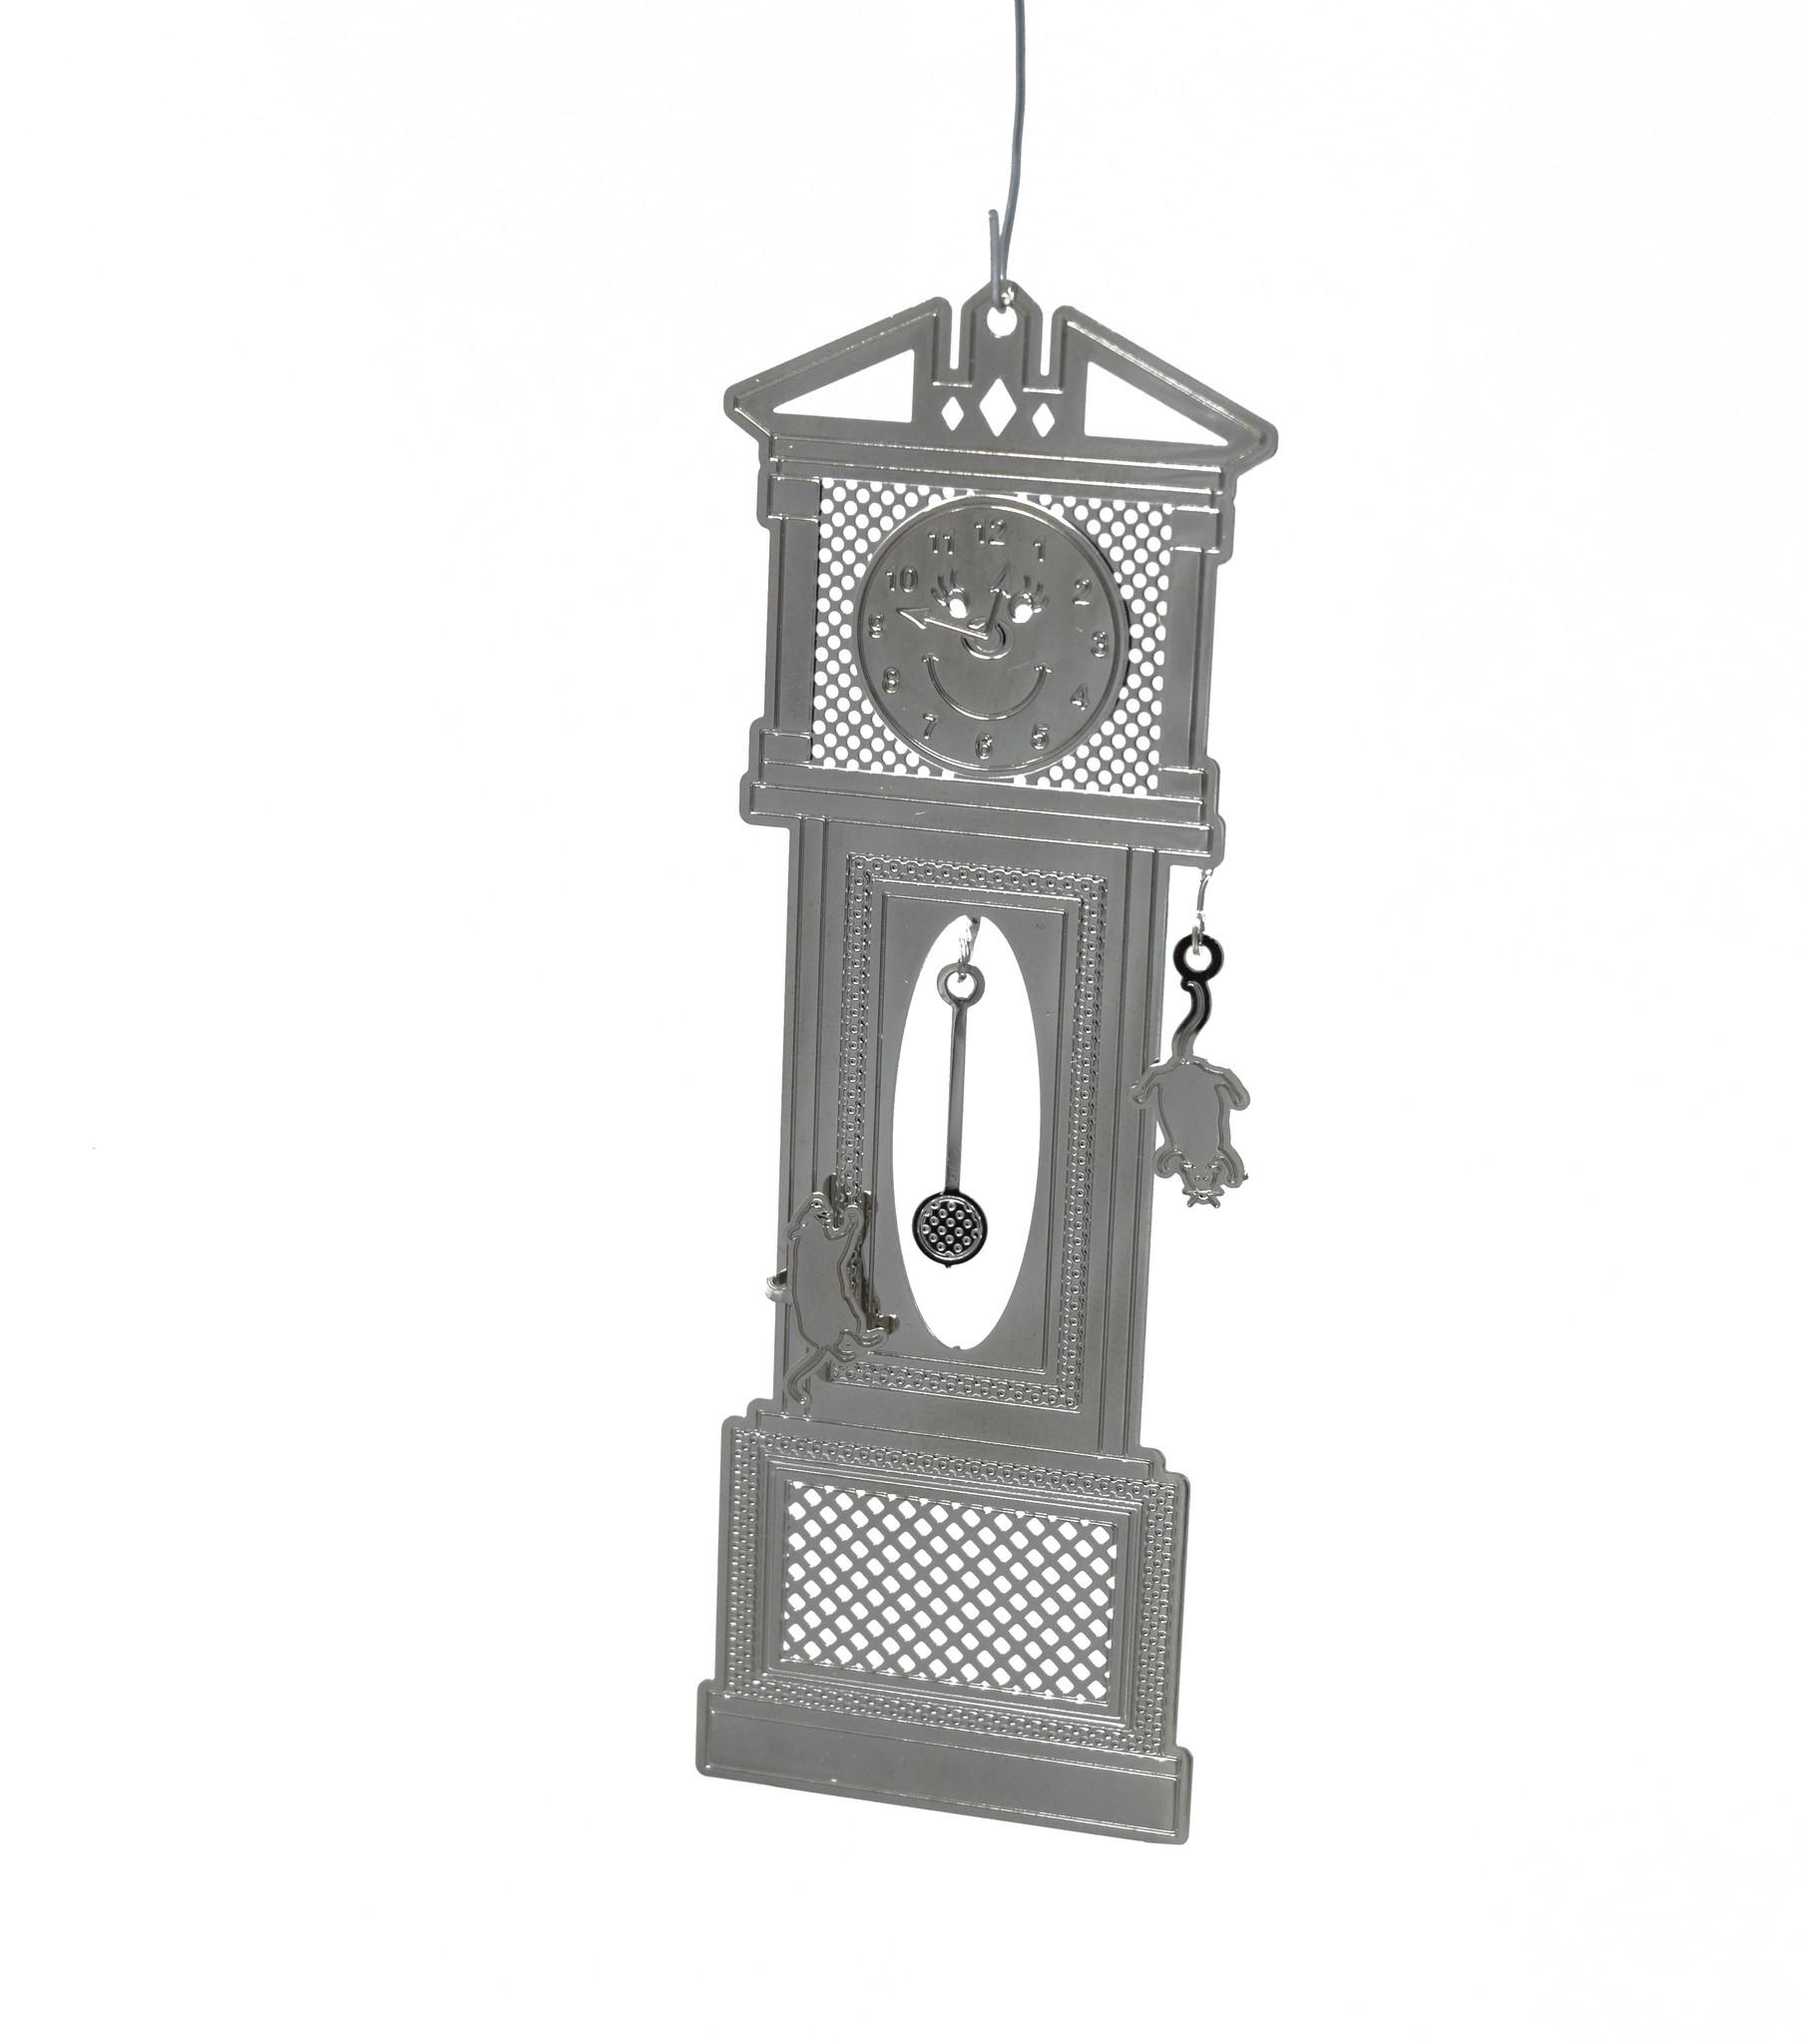 Hickory Dickory Clock-2